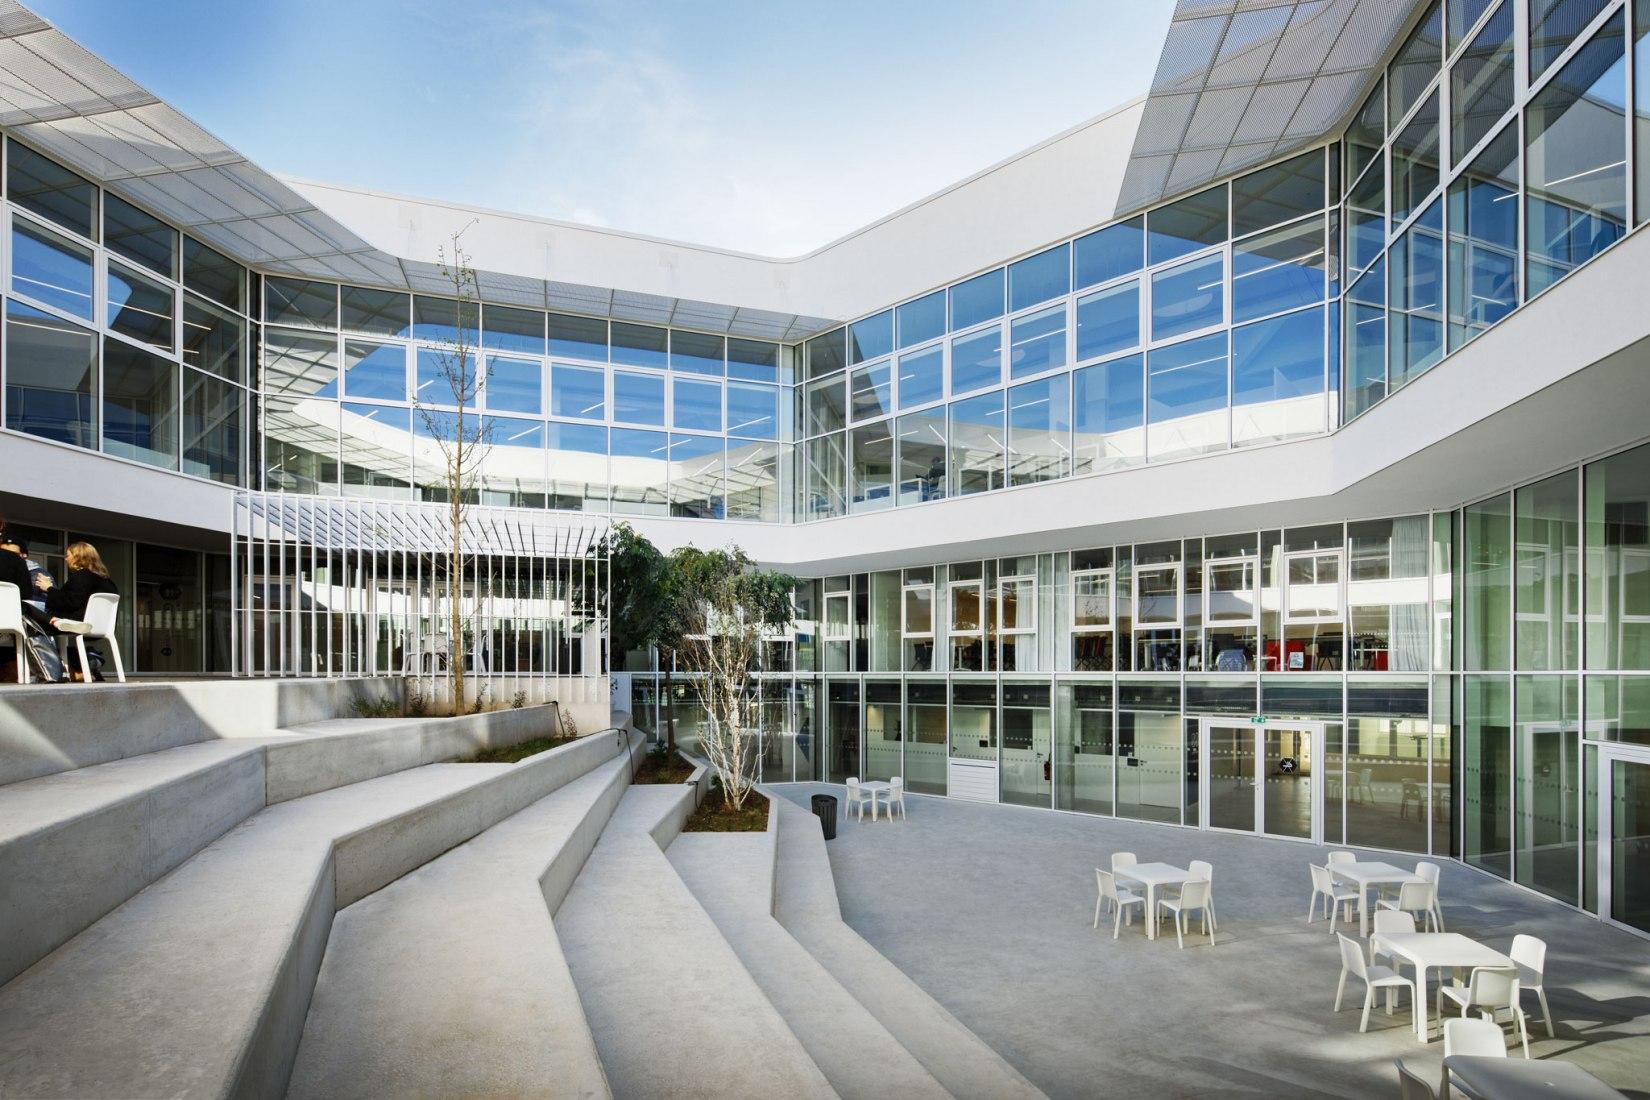 Centro de aprendizaje Hexagone, por Rémy Marciano. Fotografía por Takuji Shimmur.